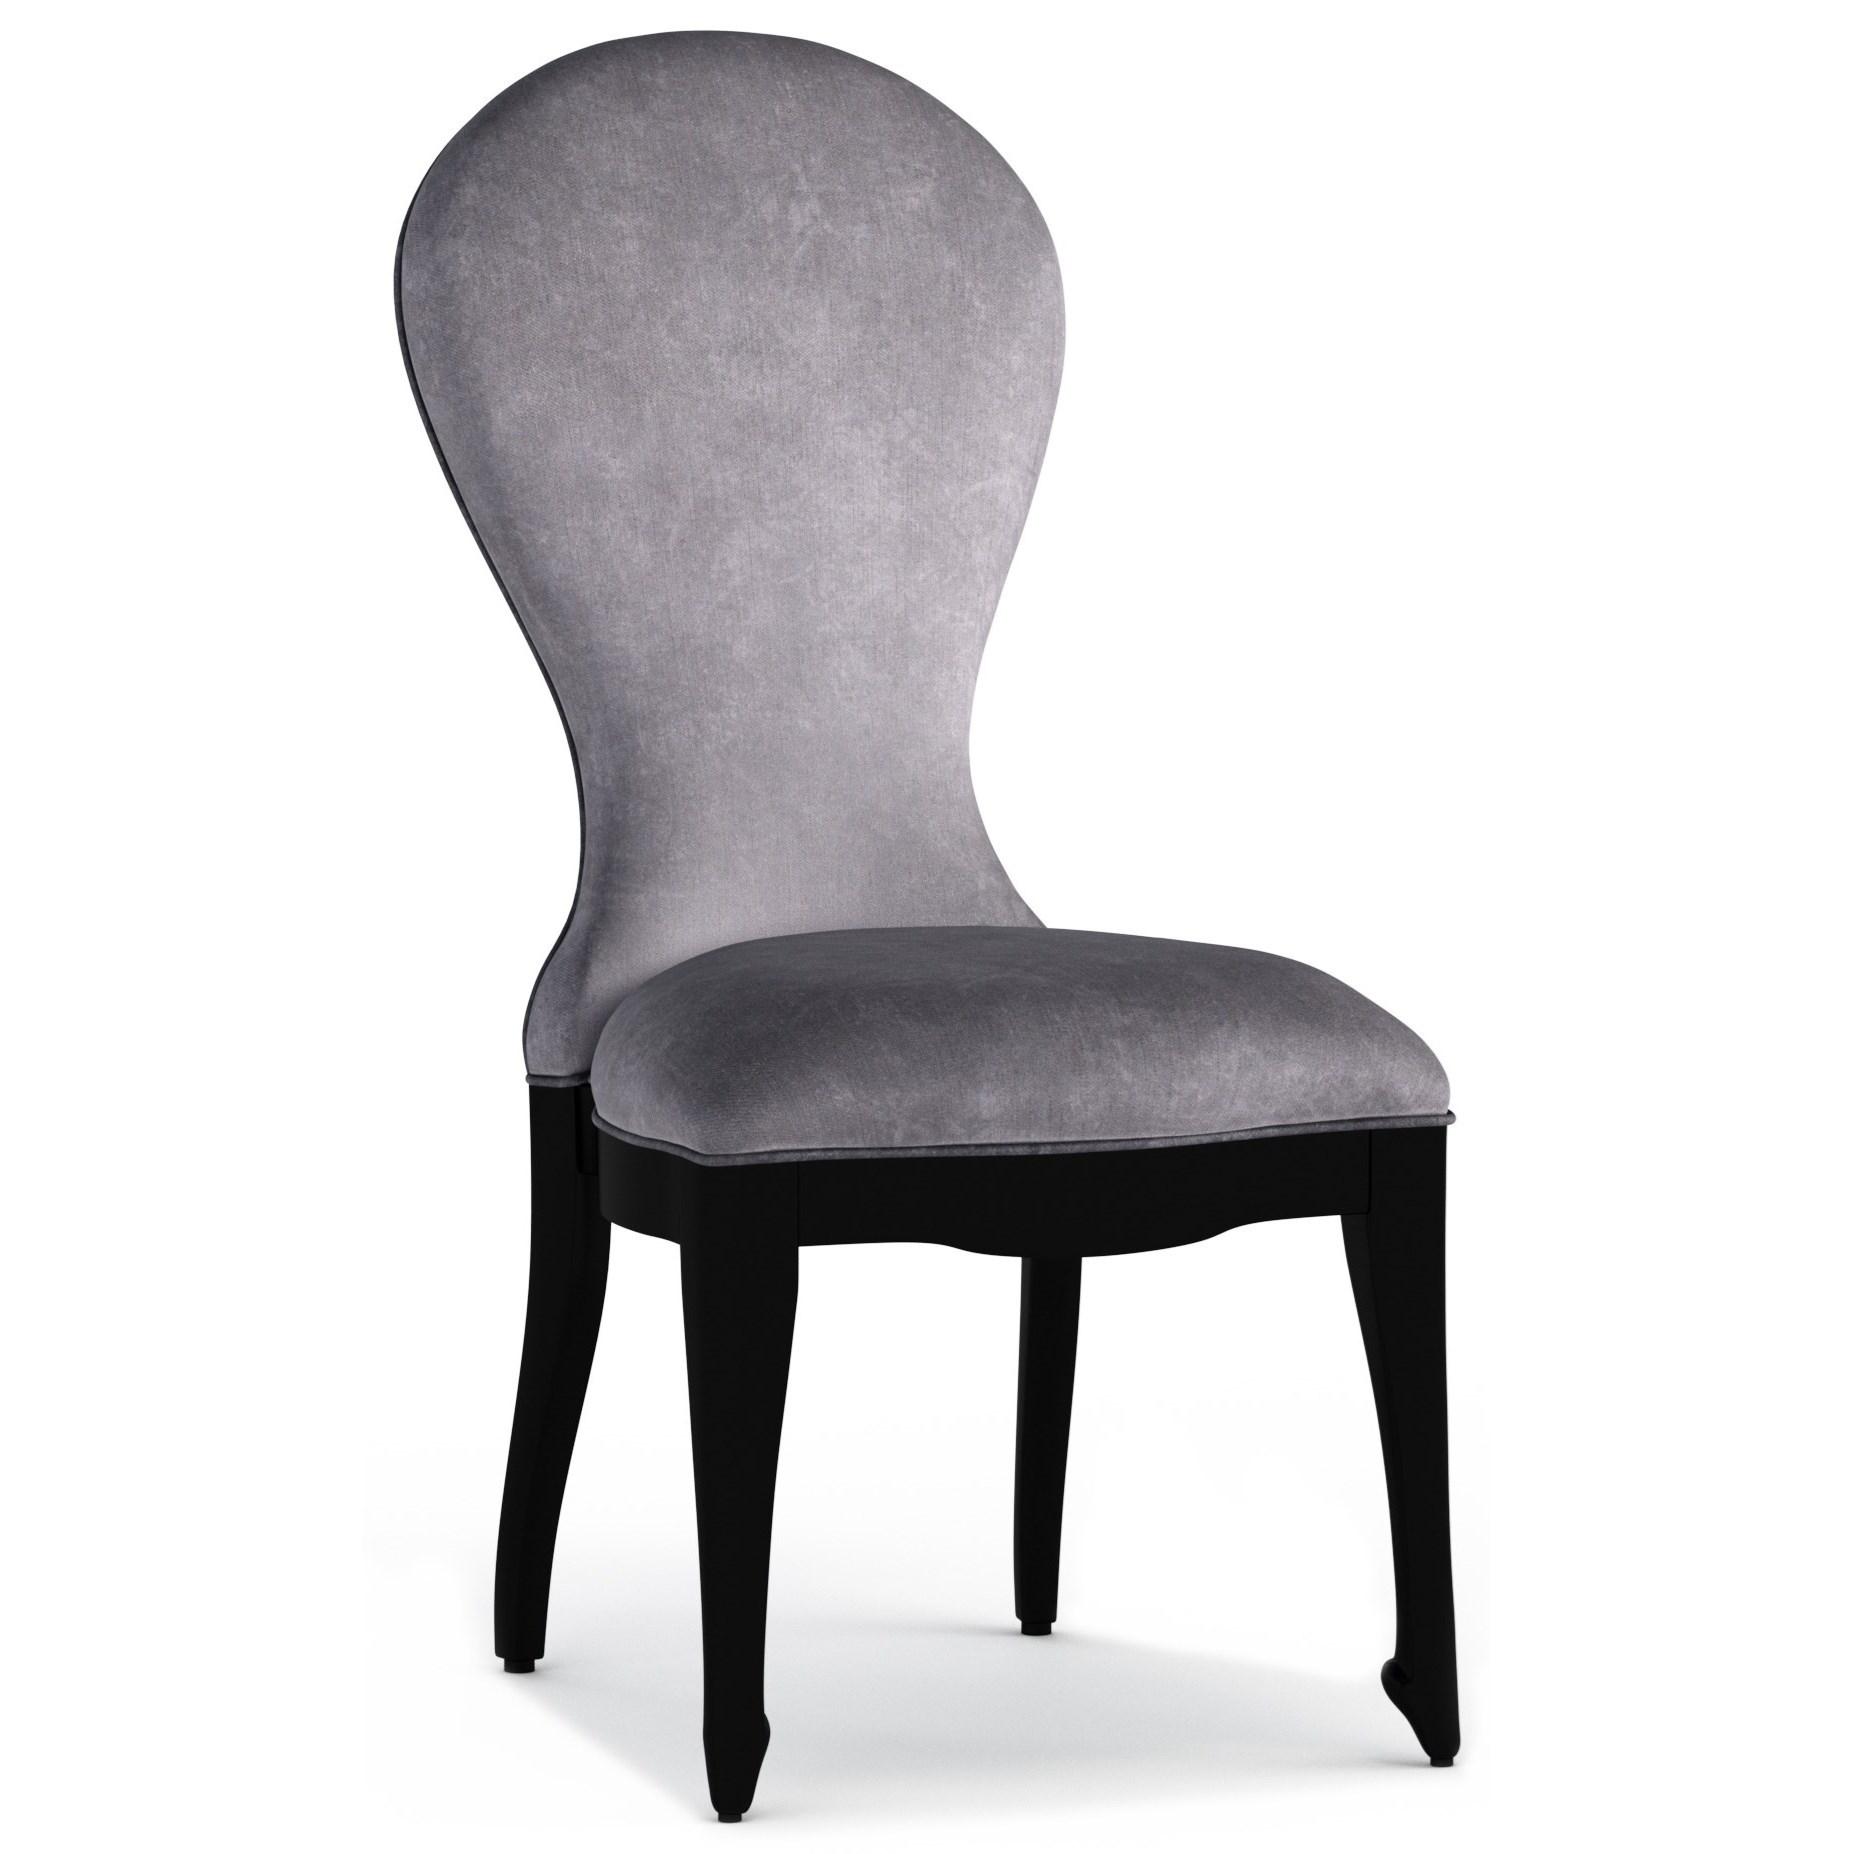 cynthia rowley chairs for sale twin sleeper sofa chair target hooker furniture